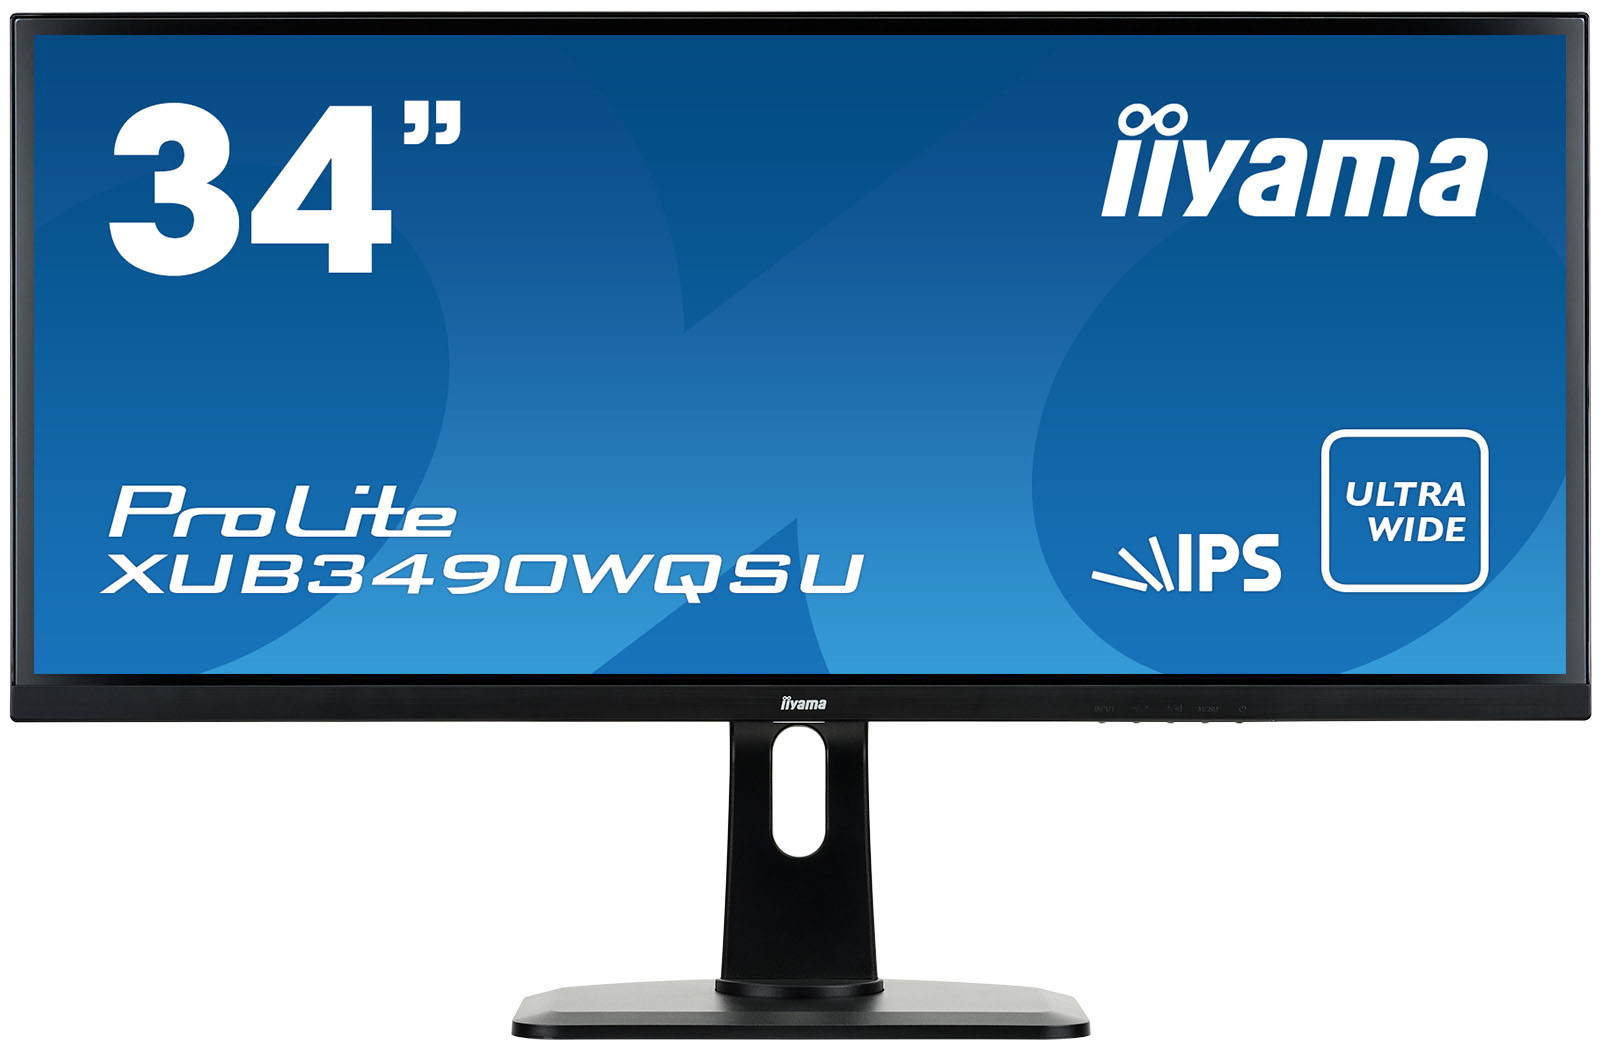 Review: iiyama ProLite XUB3490WQSU - Monitors - HEXUS net